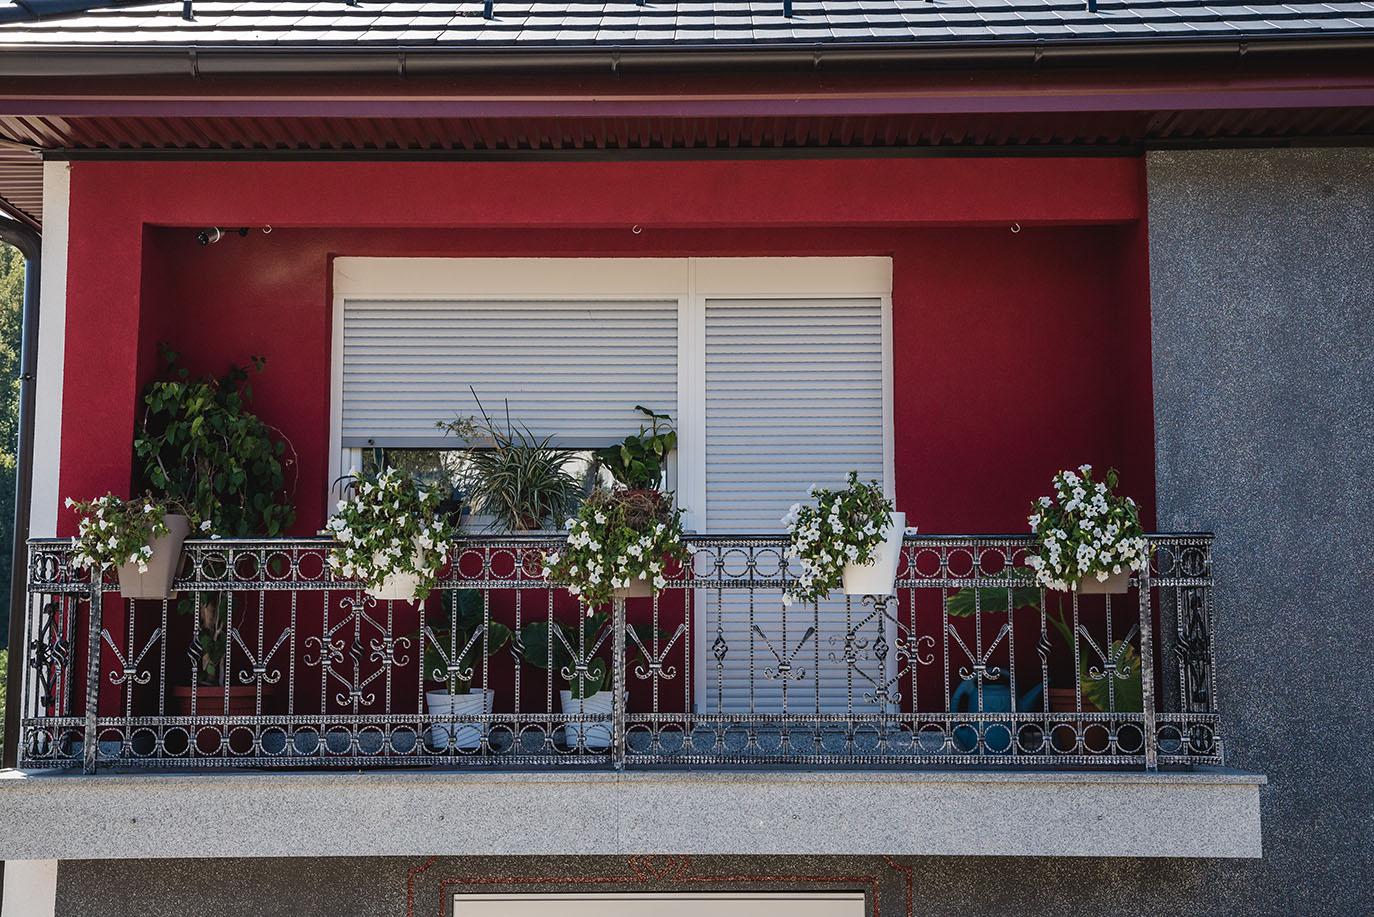 Balkonzaun